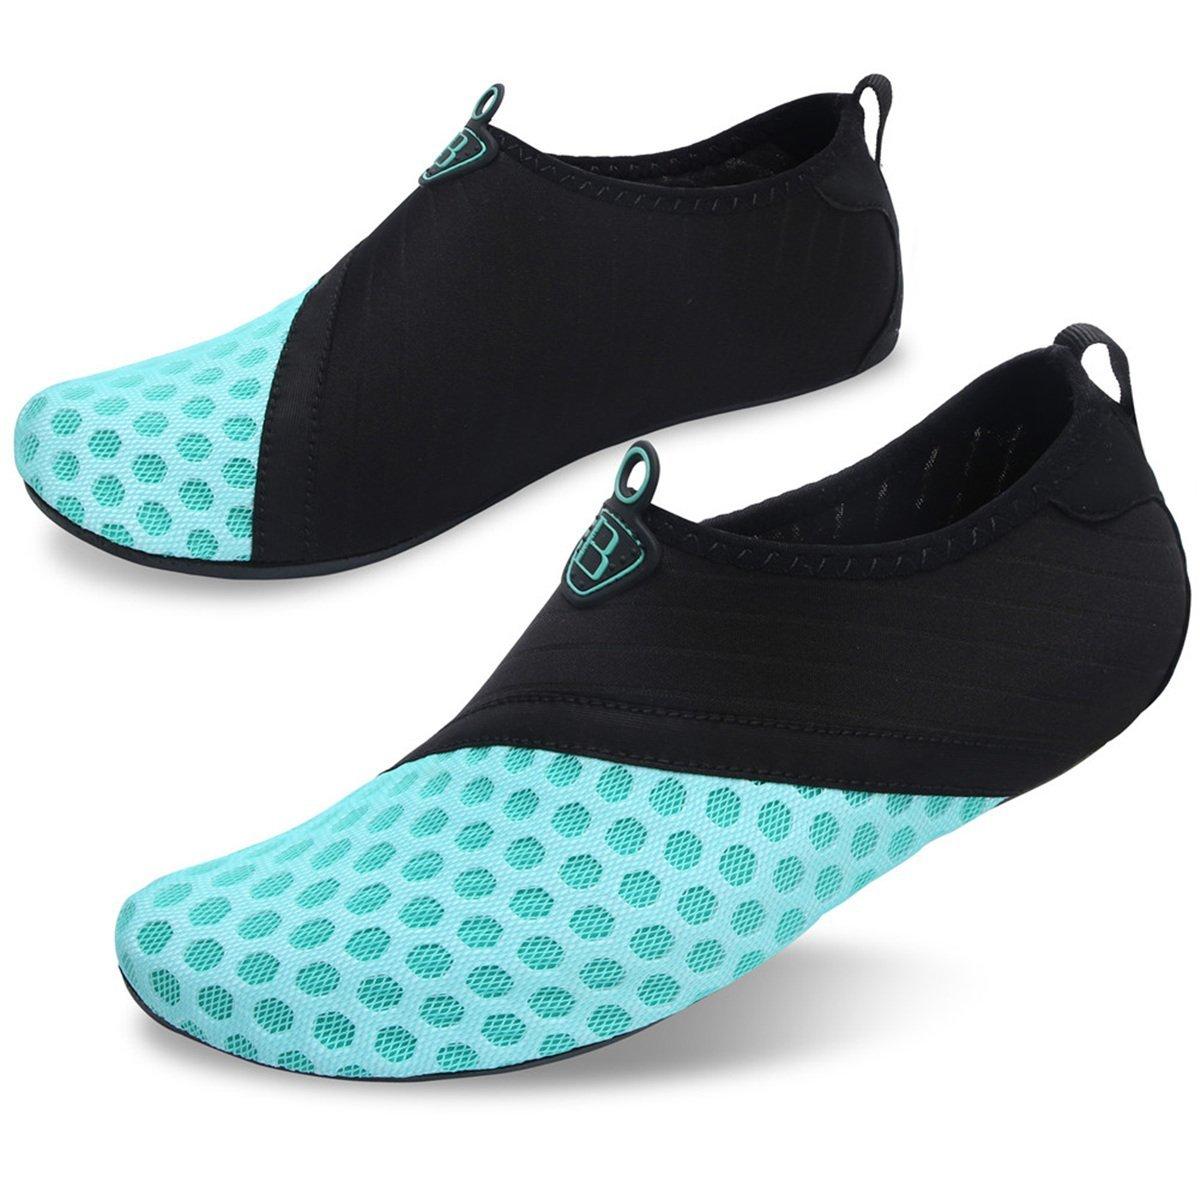 Barerun Barefoot Quick-Dry Water Sports Shoes Aqua Socks for Swim Beach Pool Surf Yoga for Women Men 8.5-9.5 US Women by Barerun (Image #6)